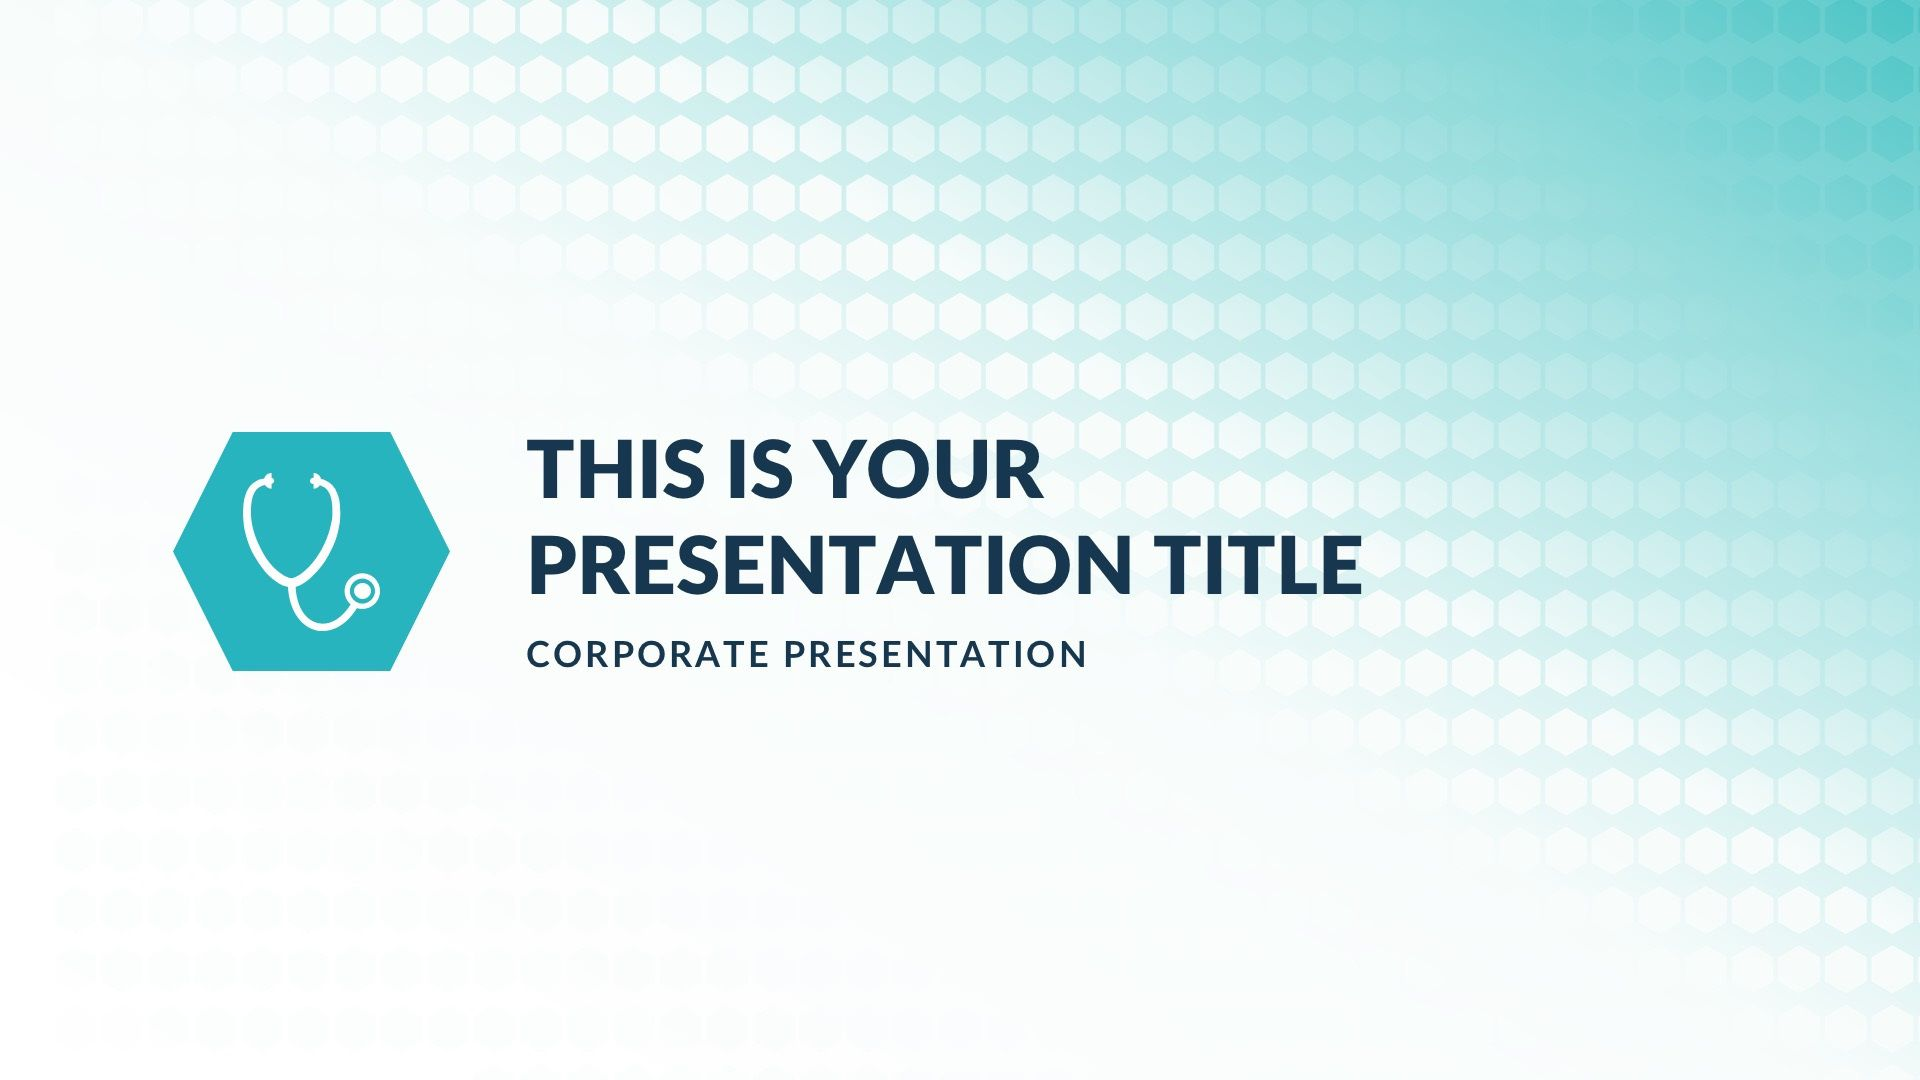 003 Marvelou Powerpoint Presentation Template Free Download Medical Design  AnimatedFull